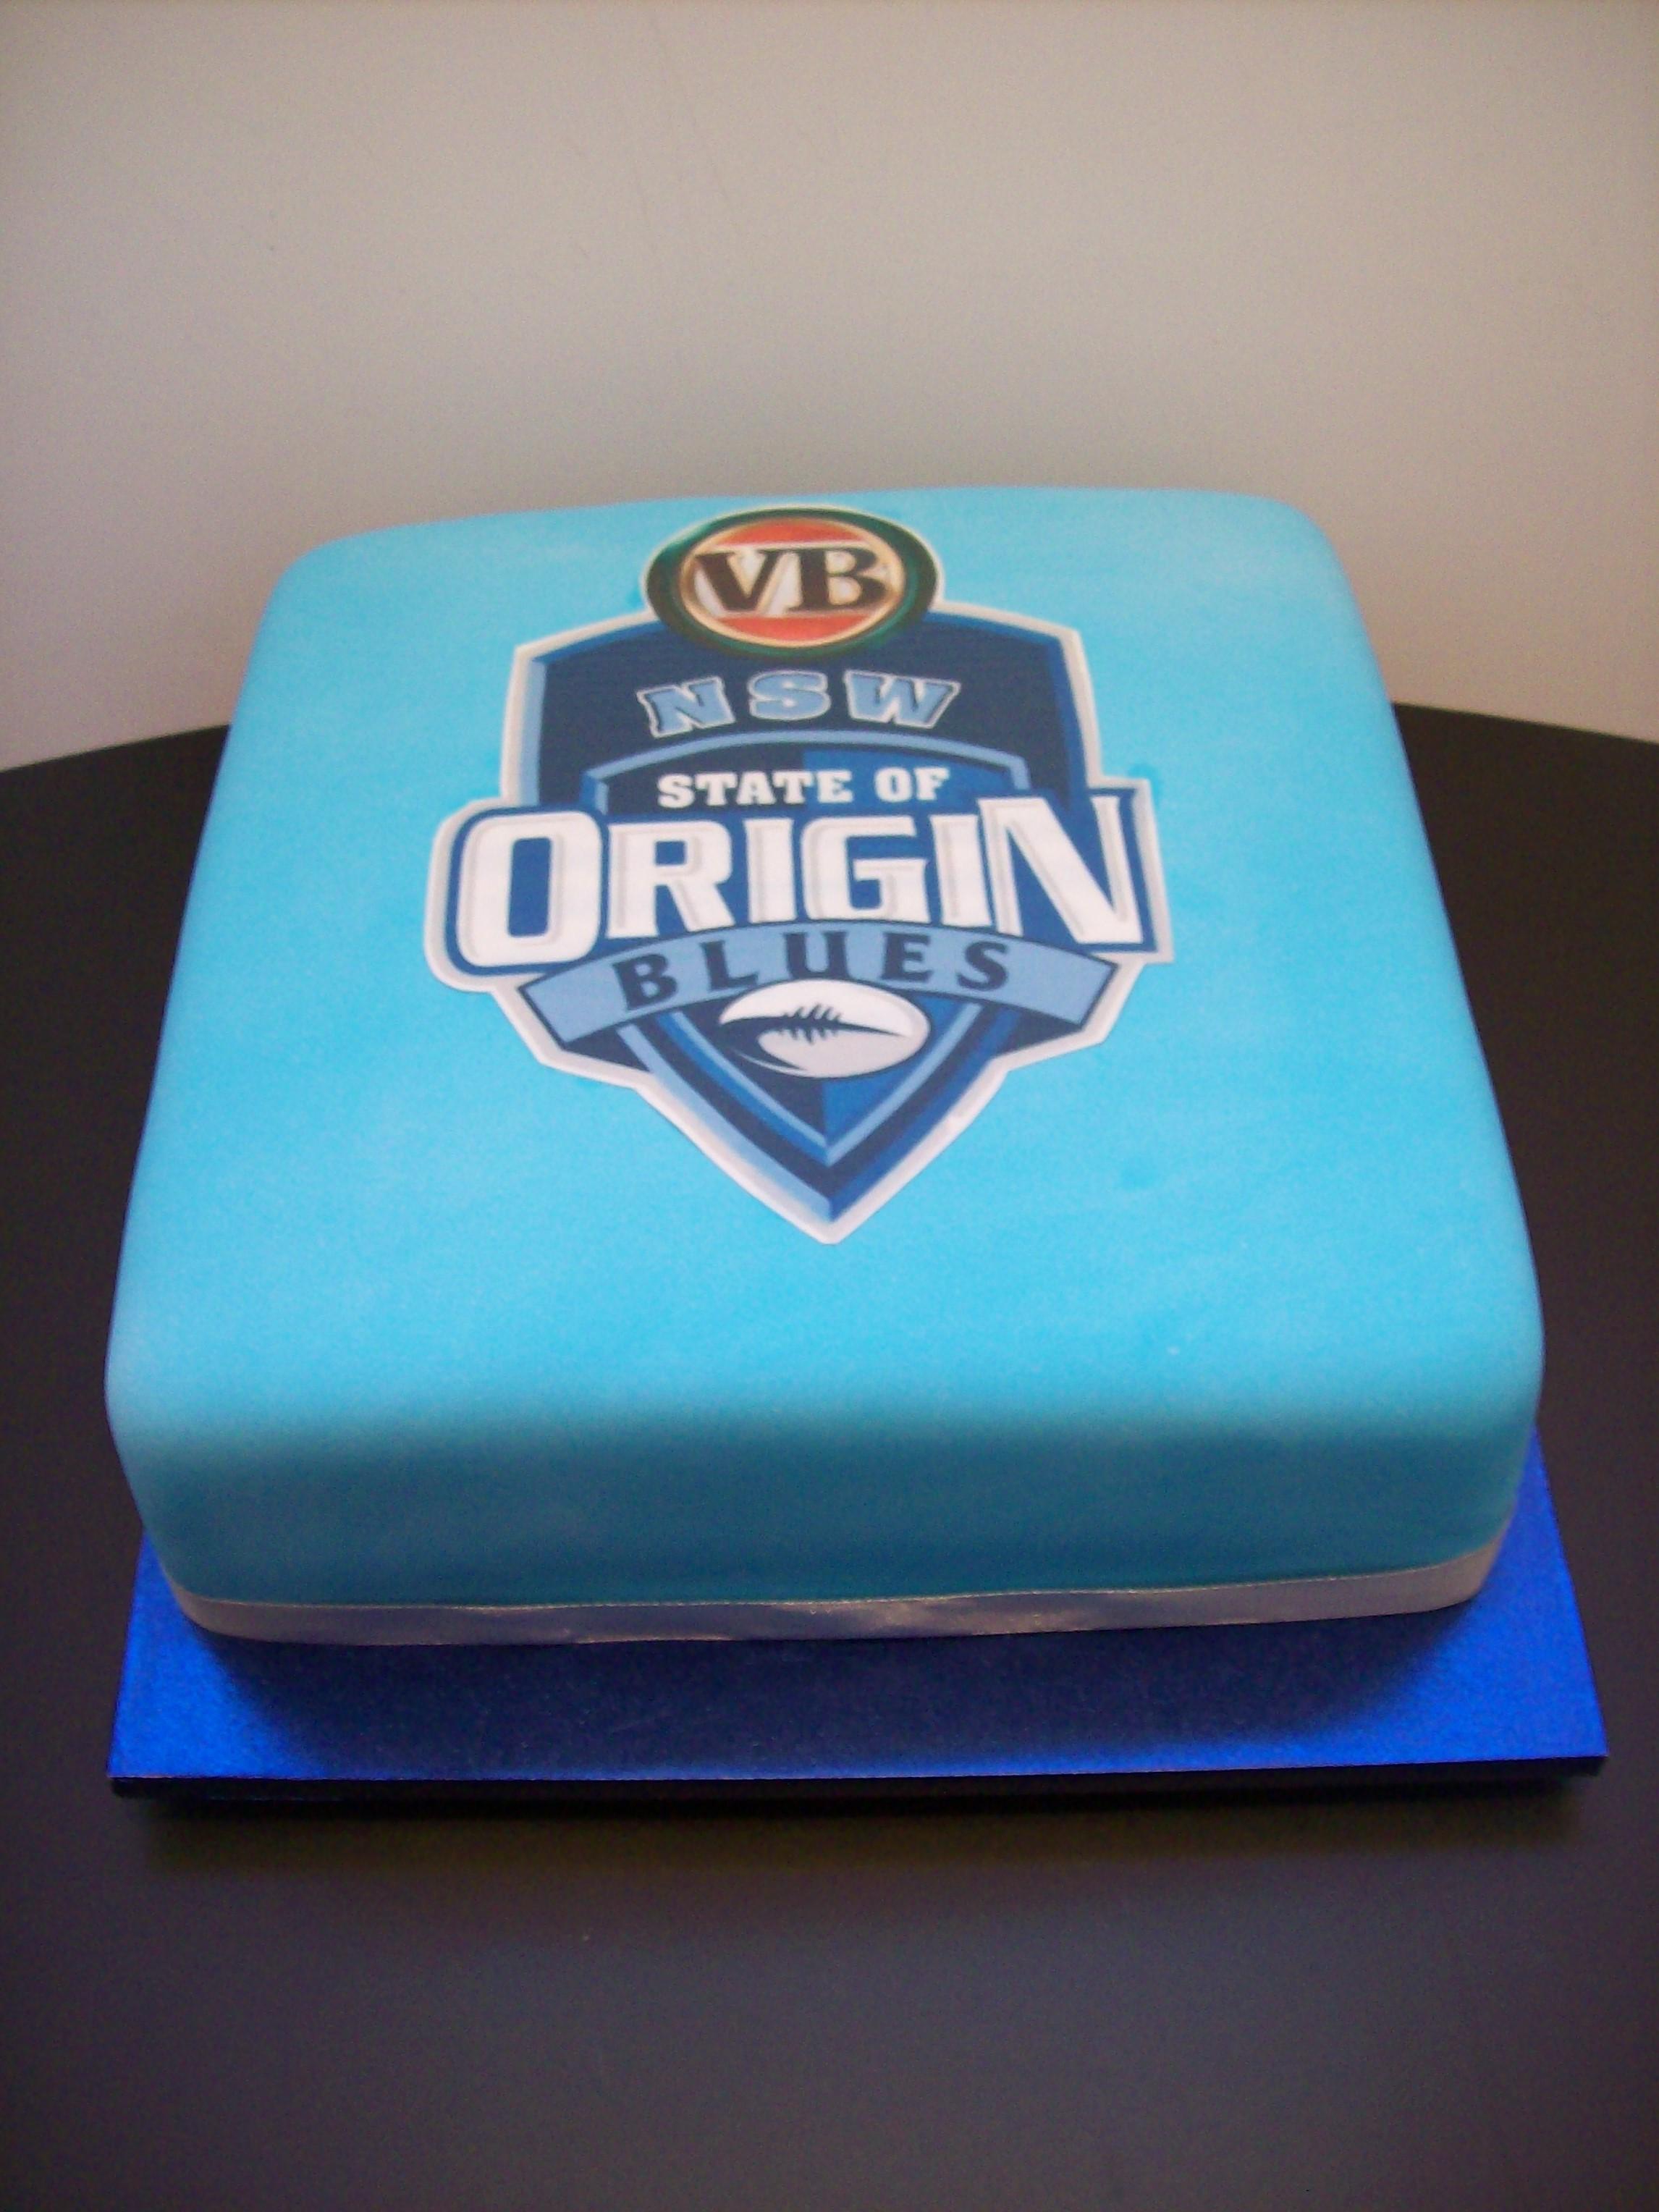 Nsw Cake 149 Temptation Cakes Temptation Cakes